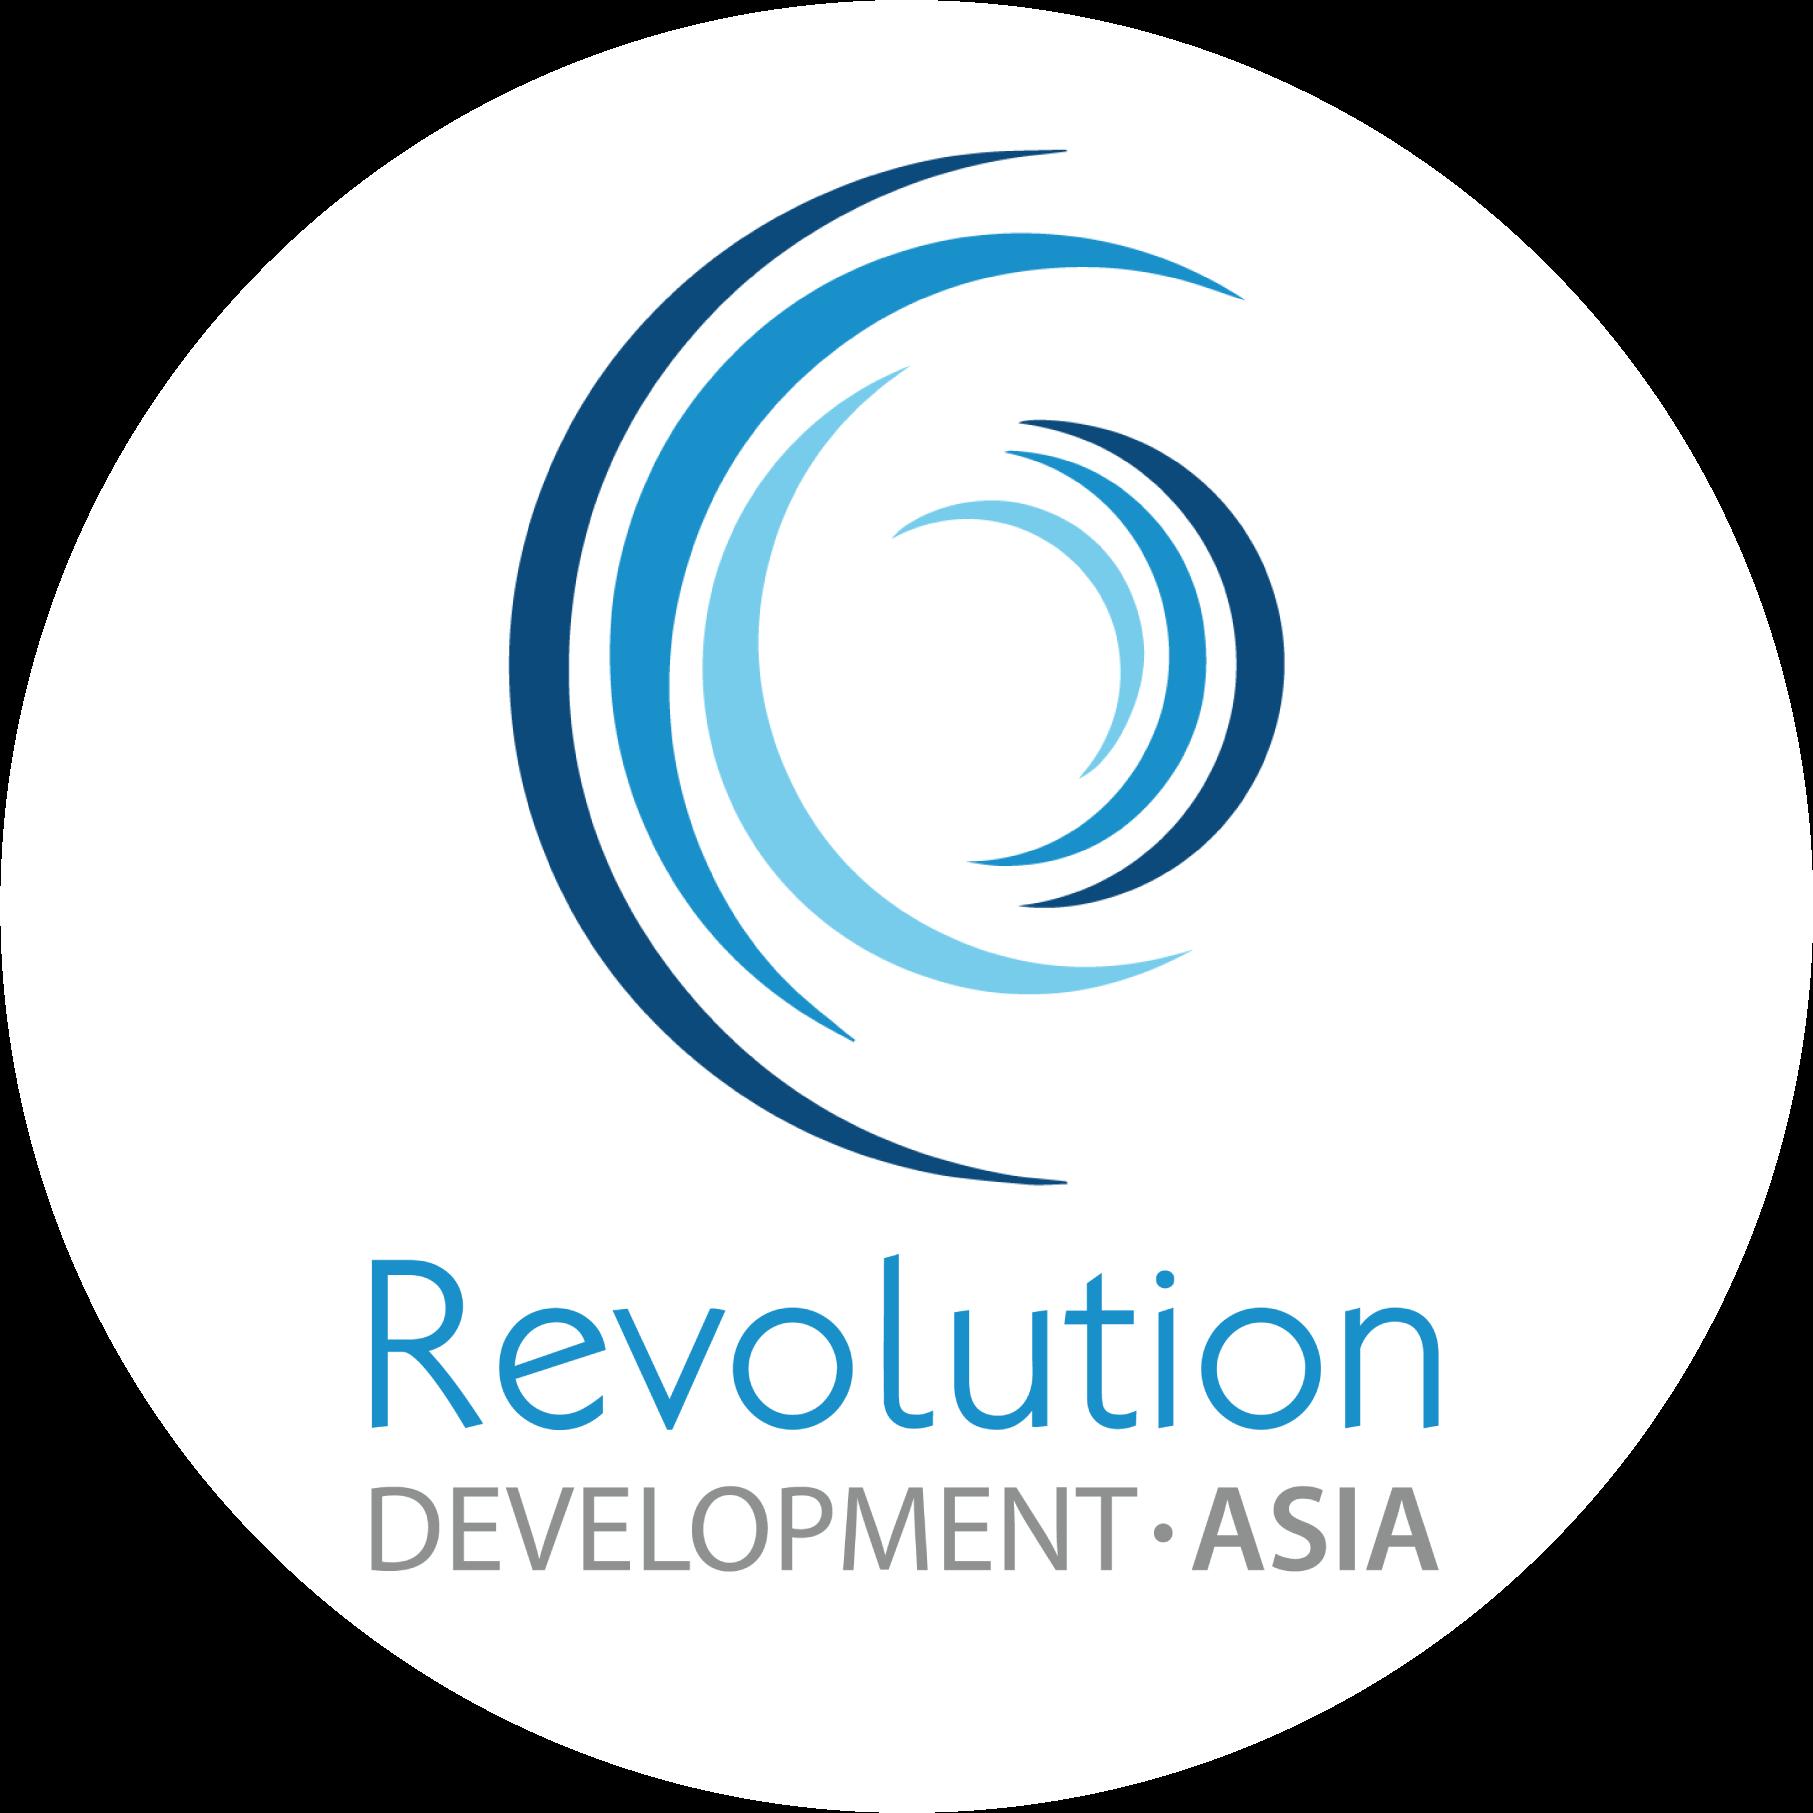 Revolution logo circle